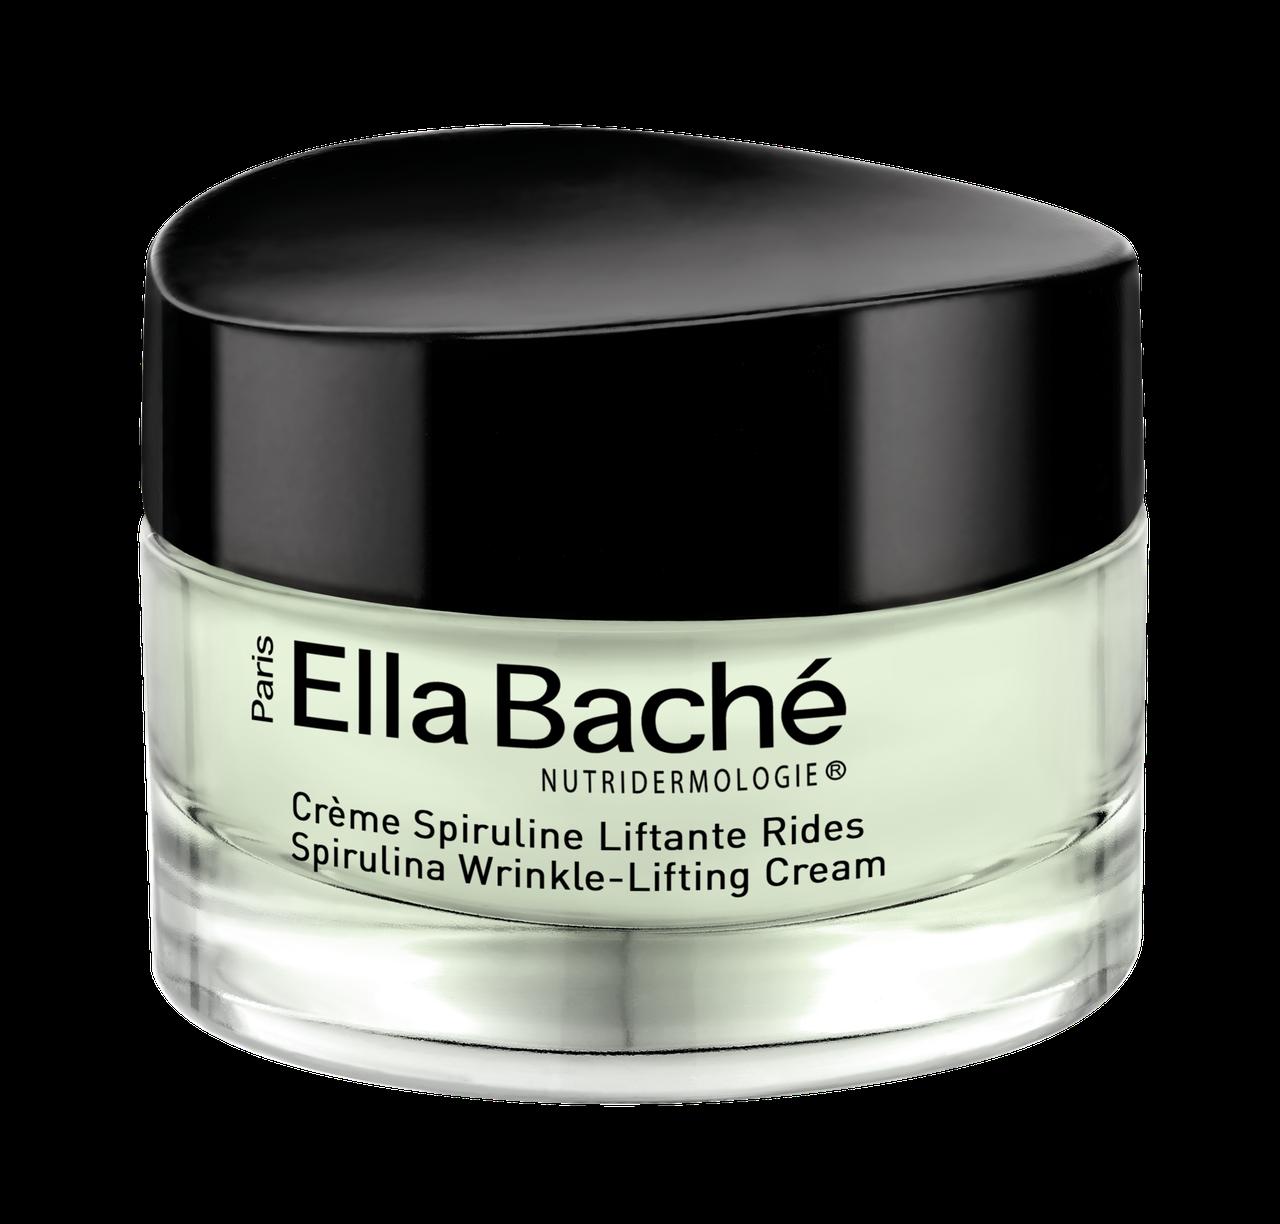 Ella Bache Spirulina Wrinkle-Lifting Cream Спирулайн Крем омолаживающий 50 мл